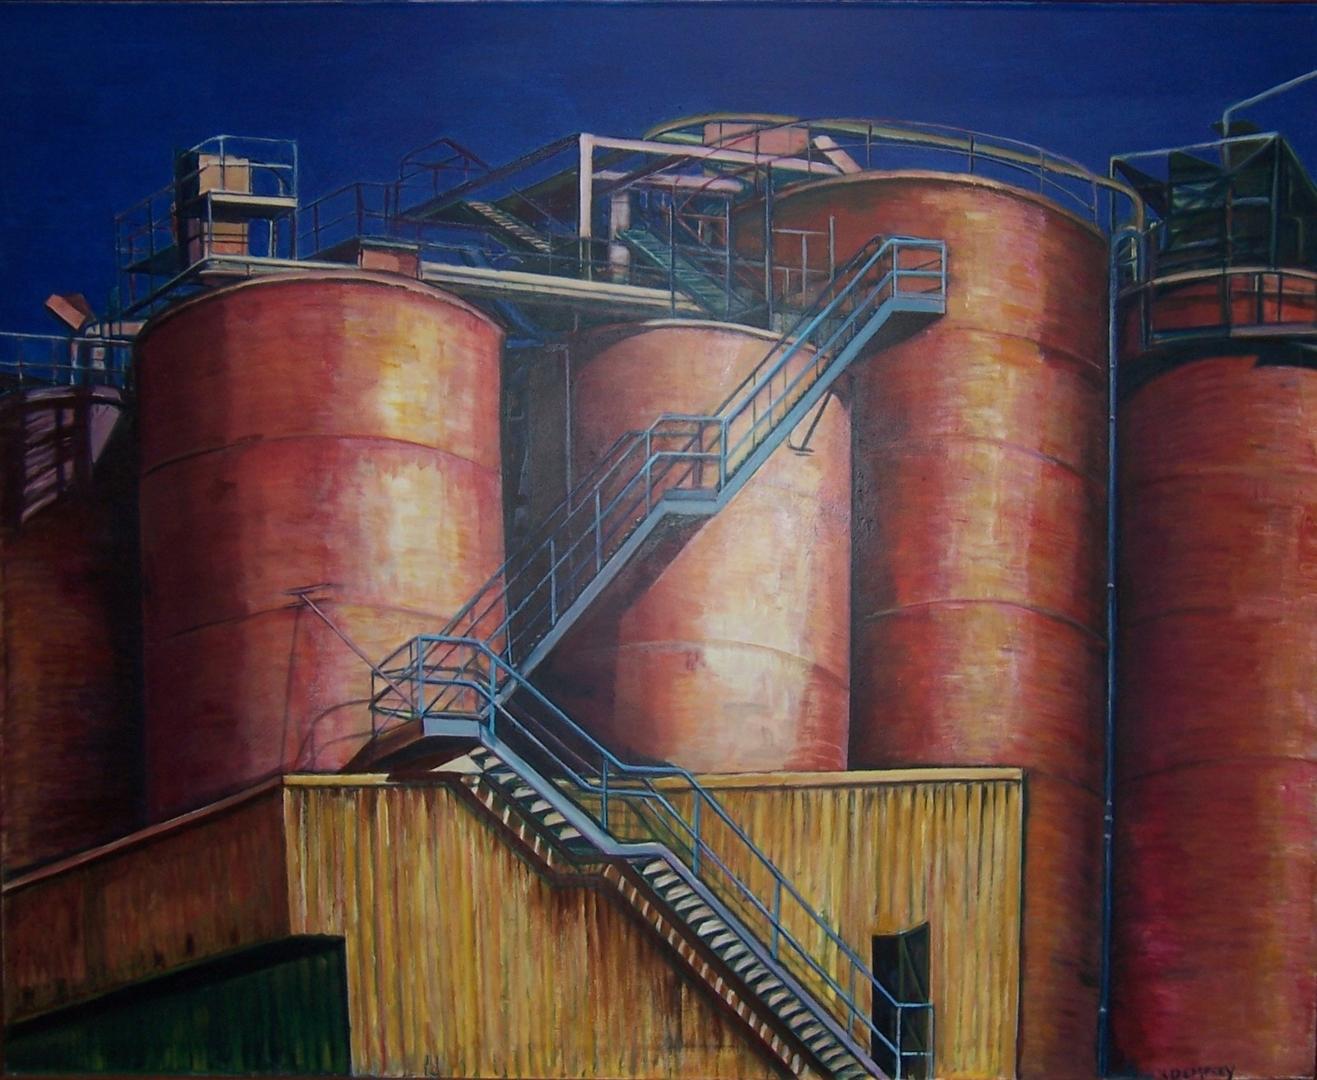 Darra Cement Works image